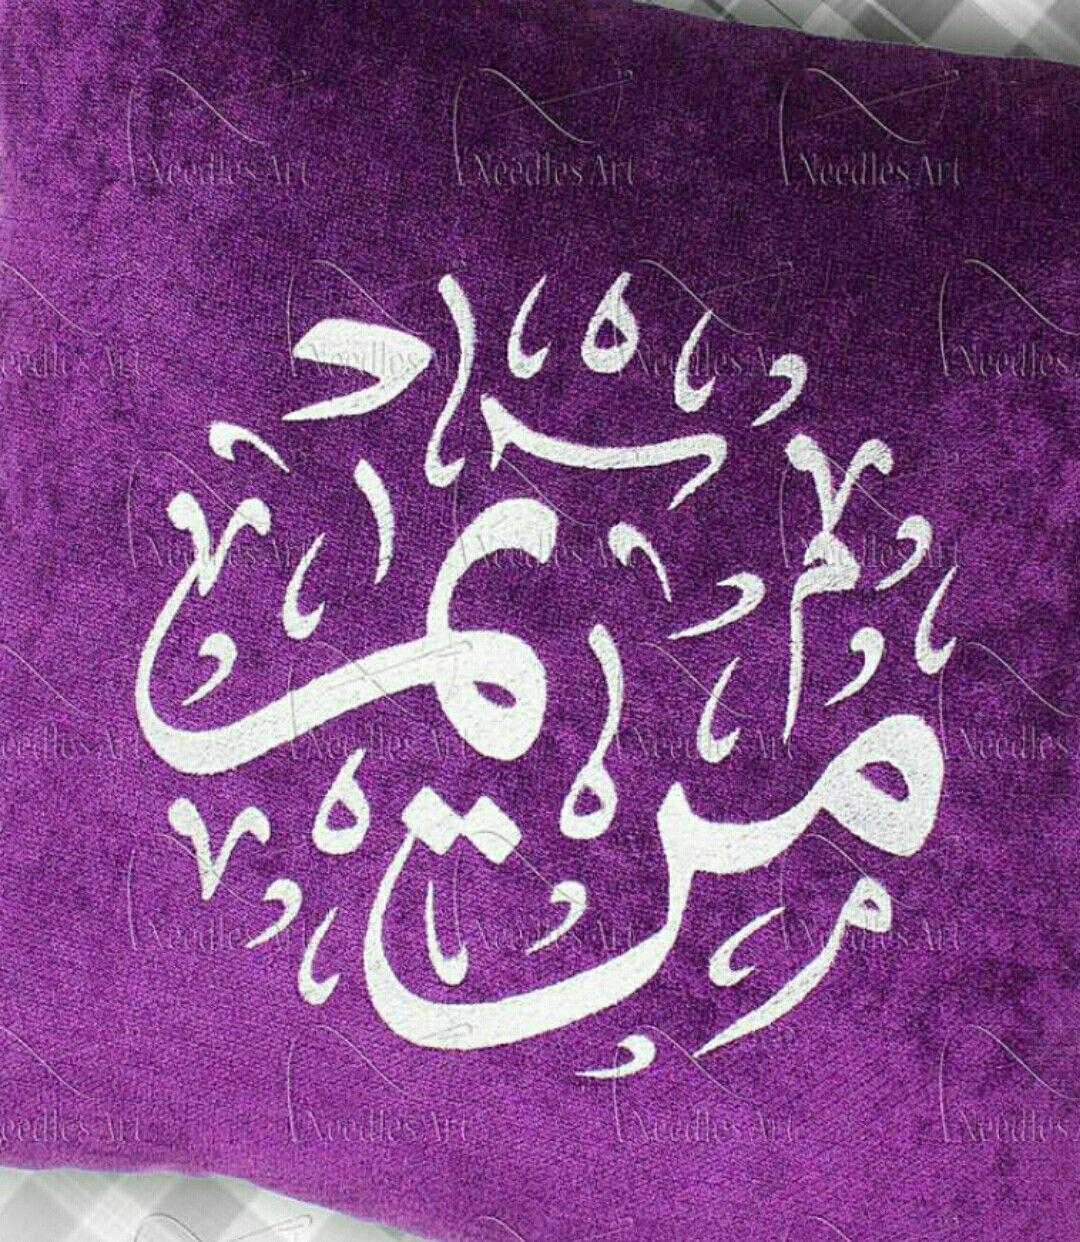 Pin By Ashraf Gavish On Names Arabic Calligraphy Art Embroidery Art Calligraphy Art